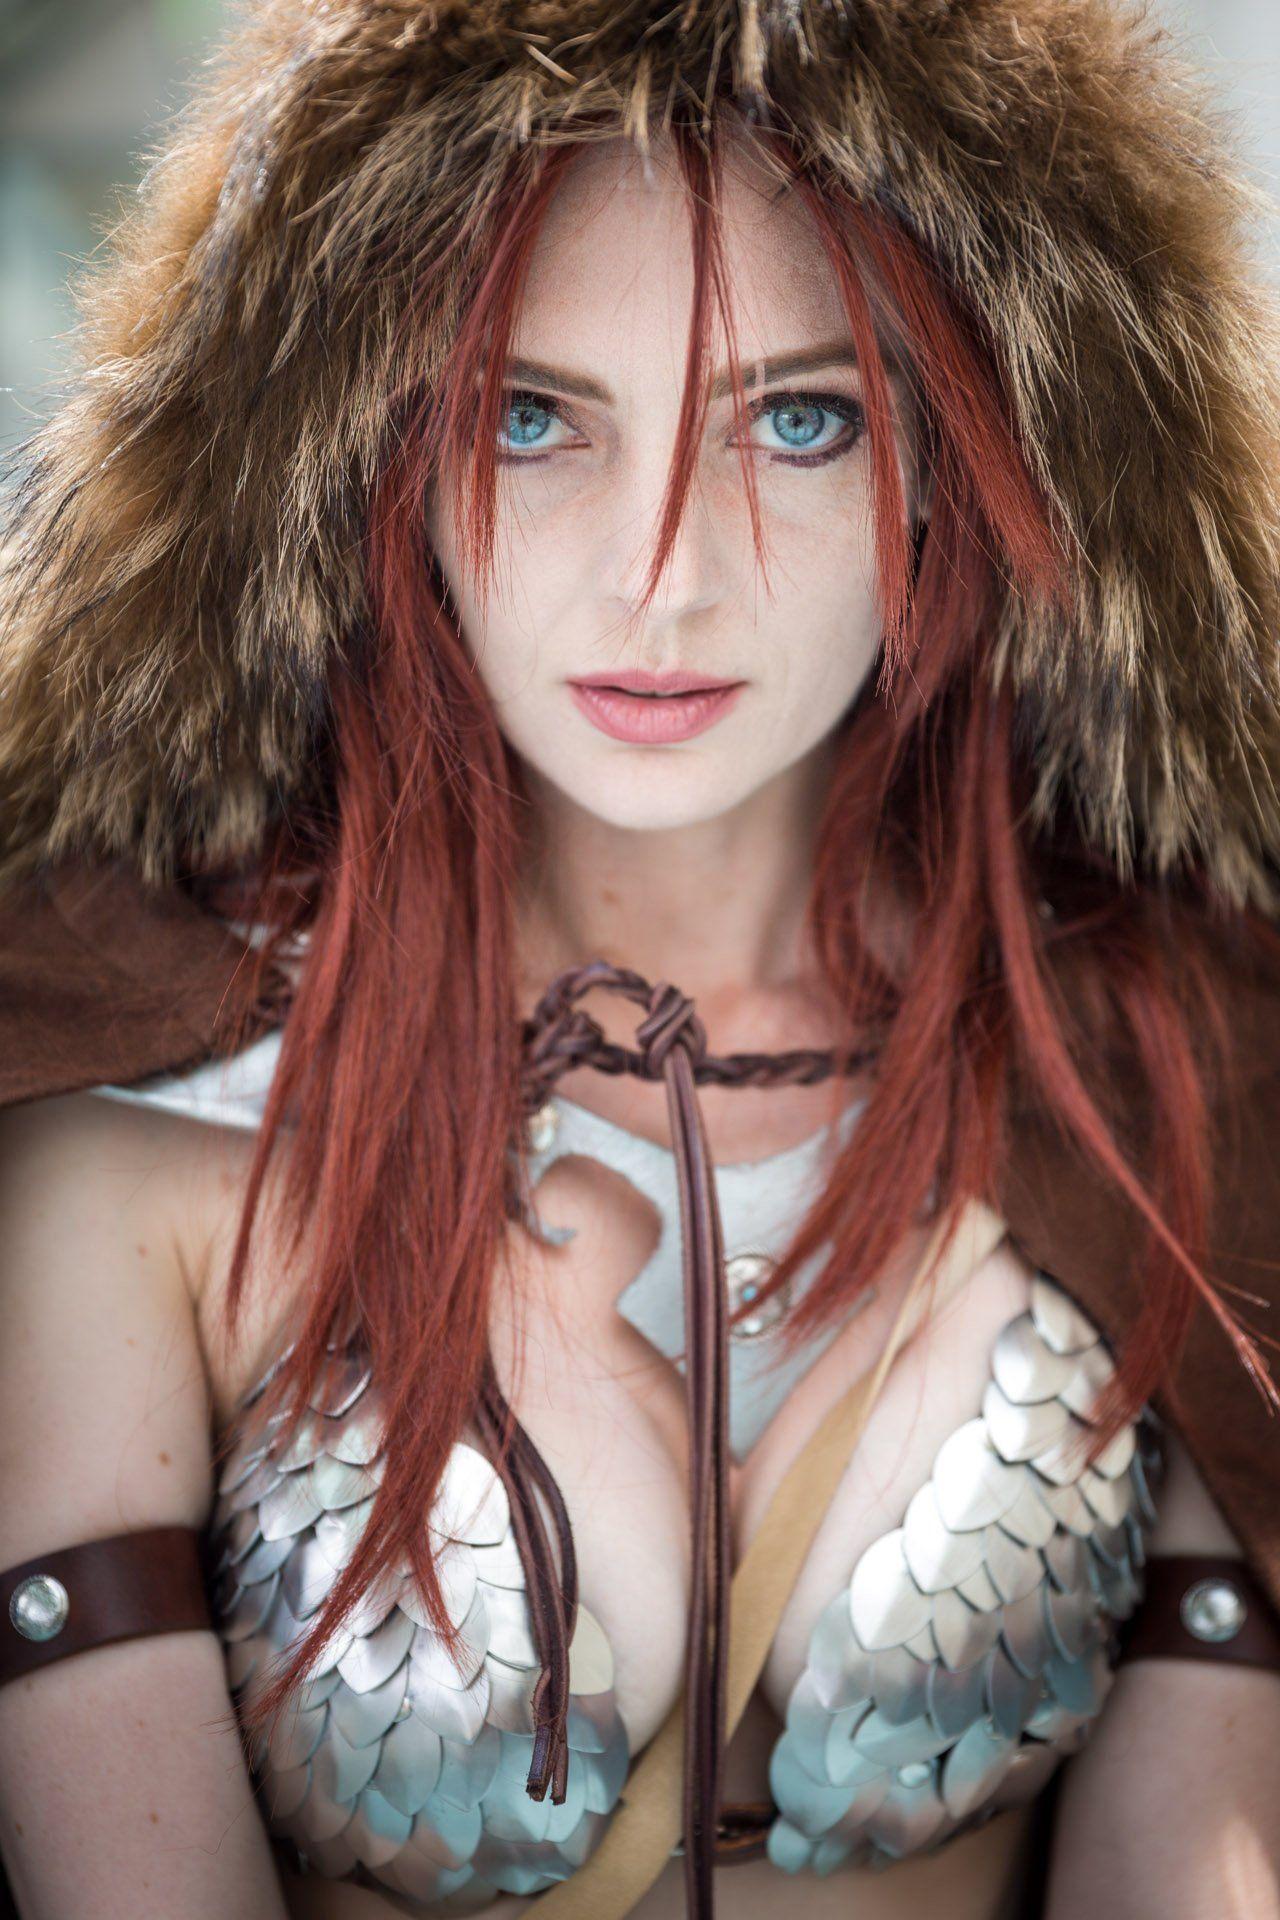 Earth E. reccomend Freaky girl redhead